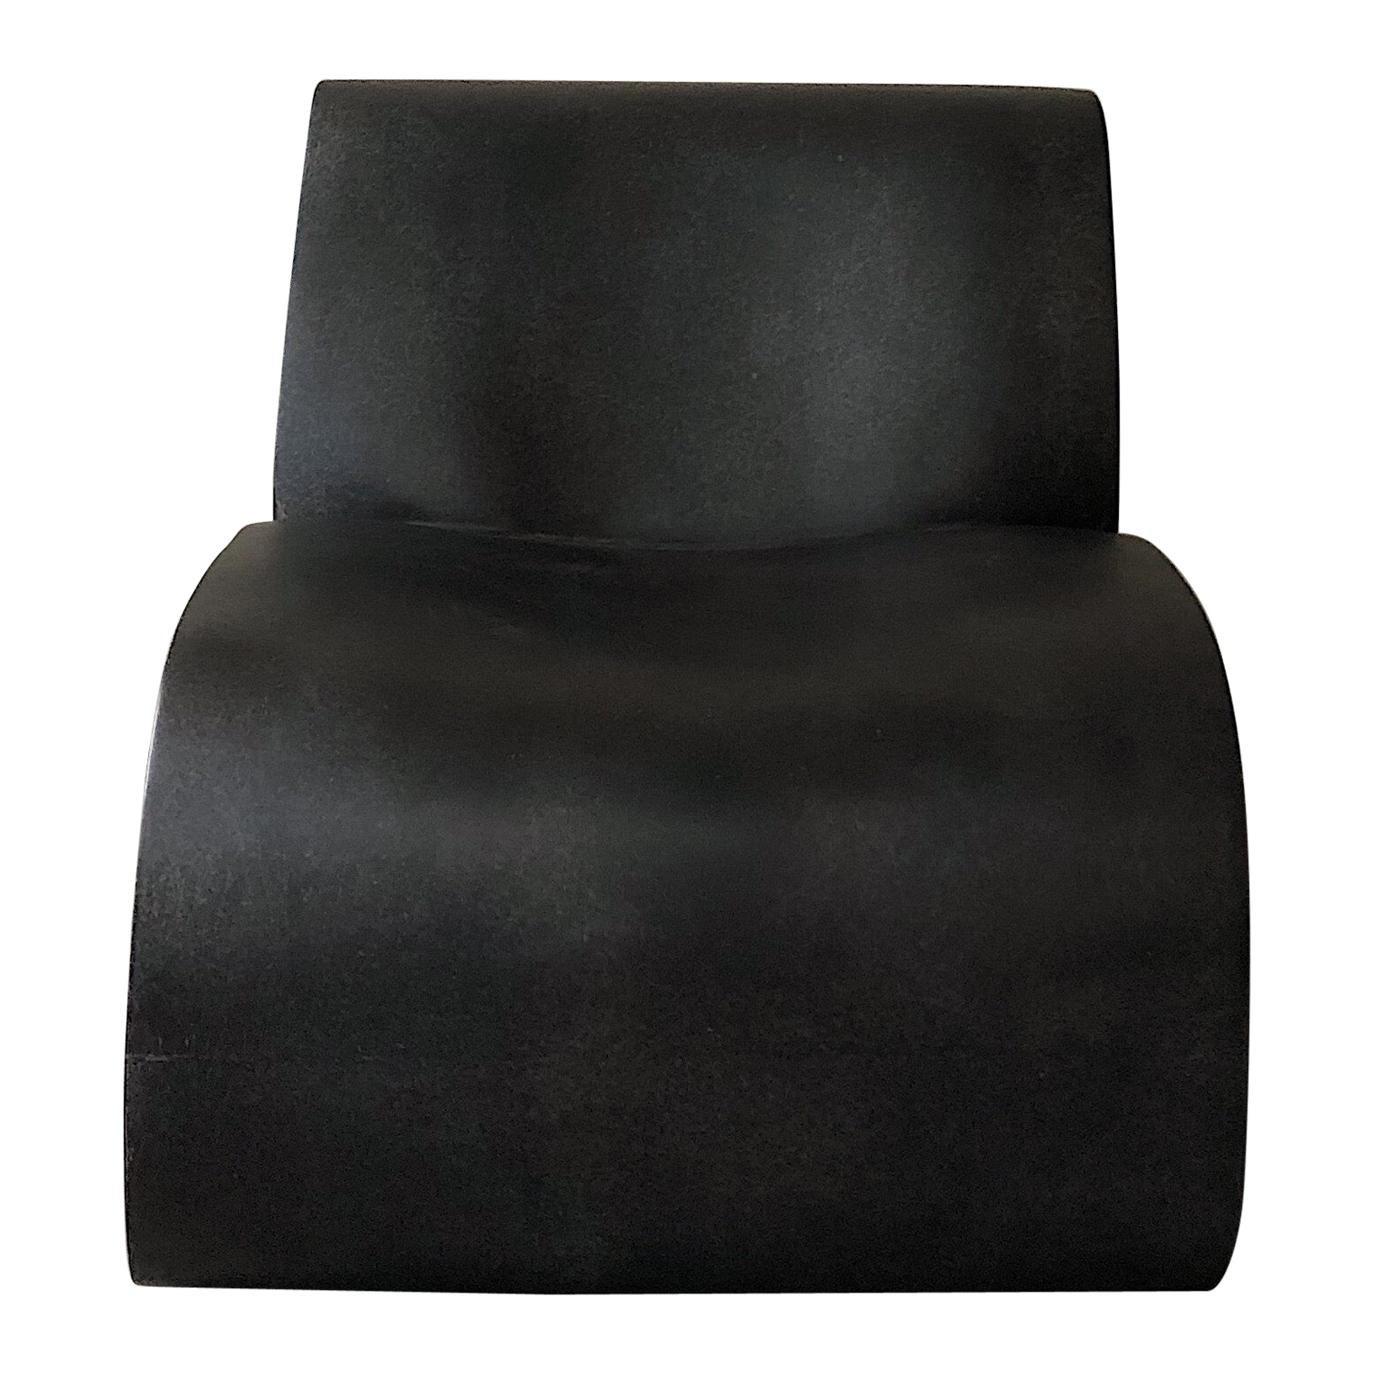 Coffee Curl Up Lounge Chair by Karstudio